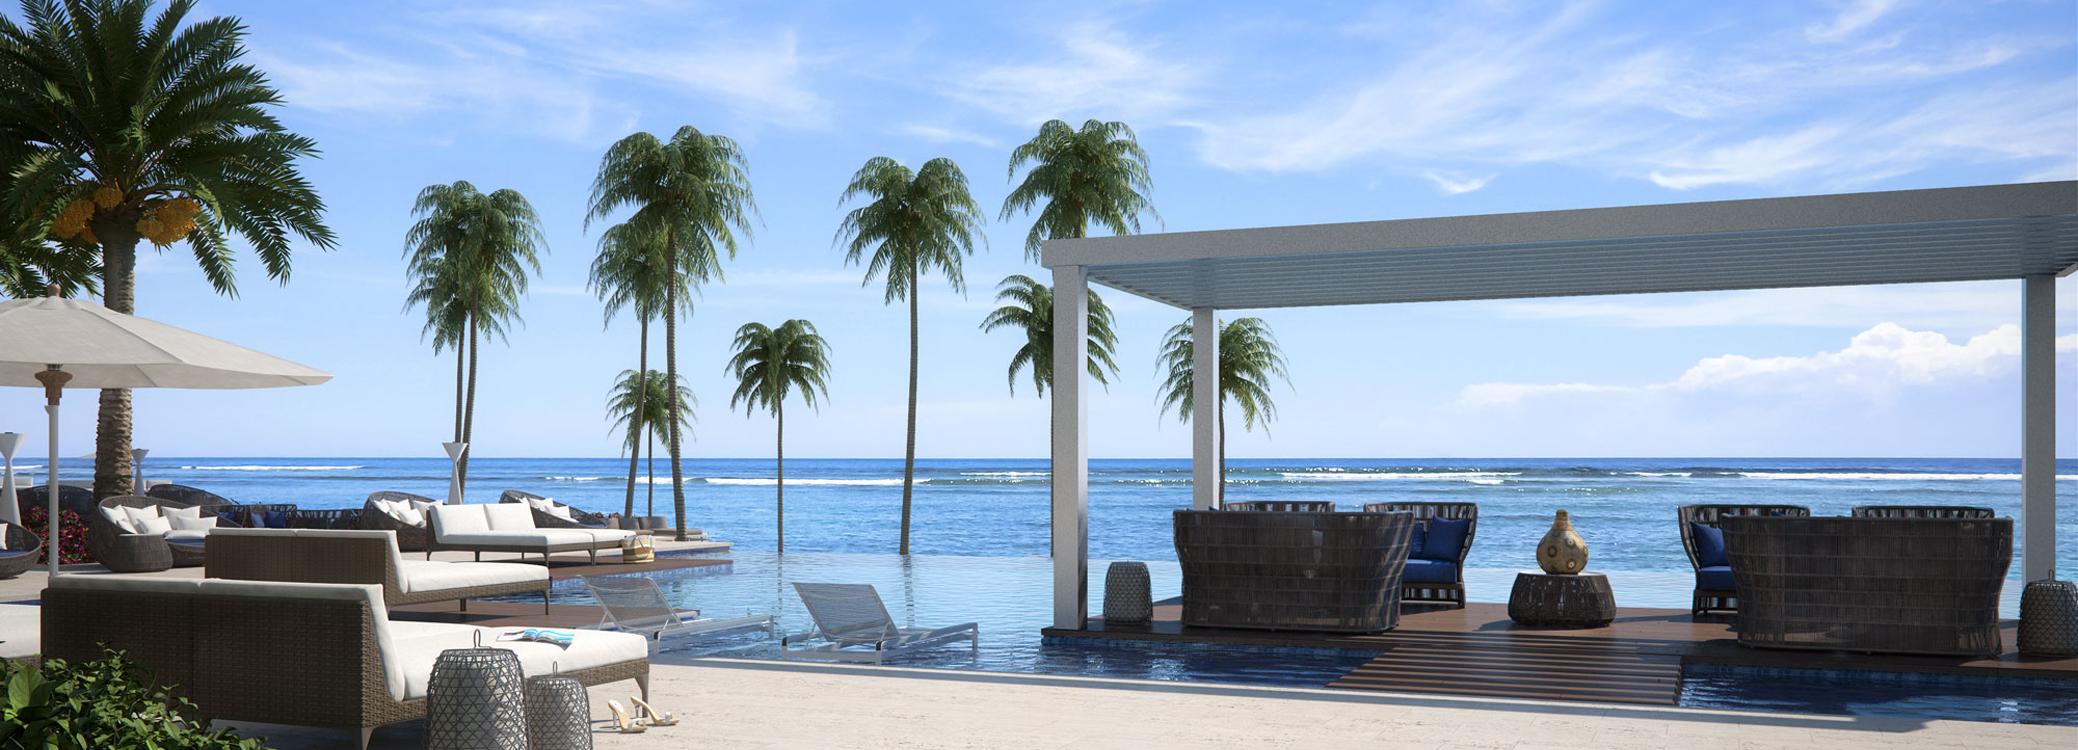 Aruba Beach Club For Sale By Owner